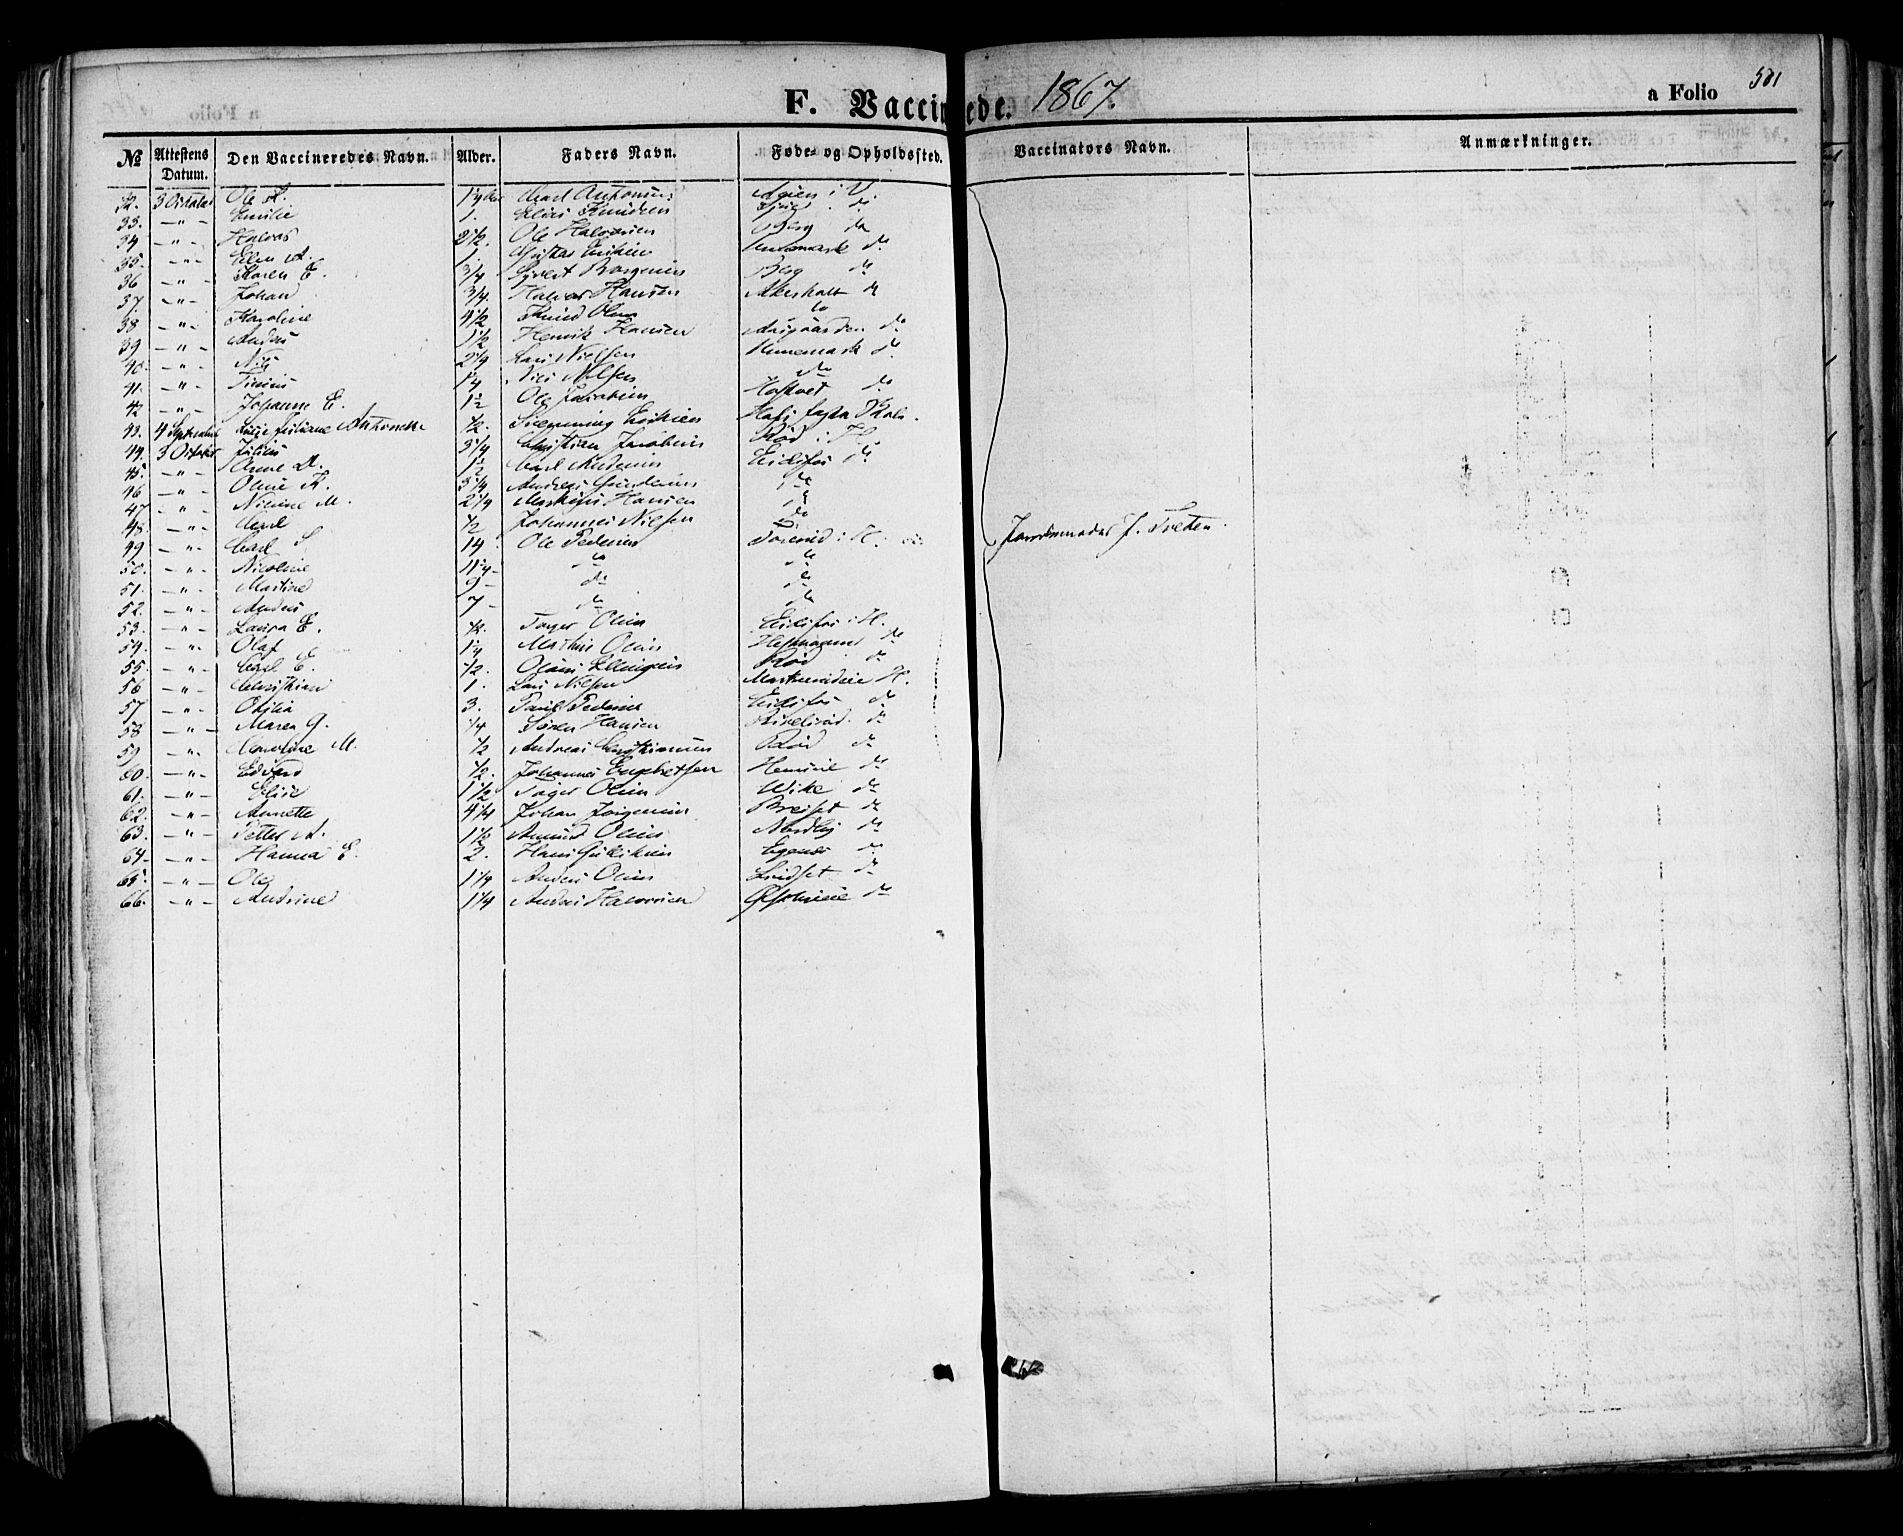 SAKO, Hof kirkebøker, F/Fa/L0006: Ministerialbok nr. I 6, 1851-1877, s. 501